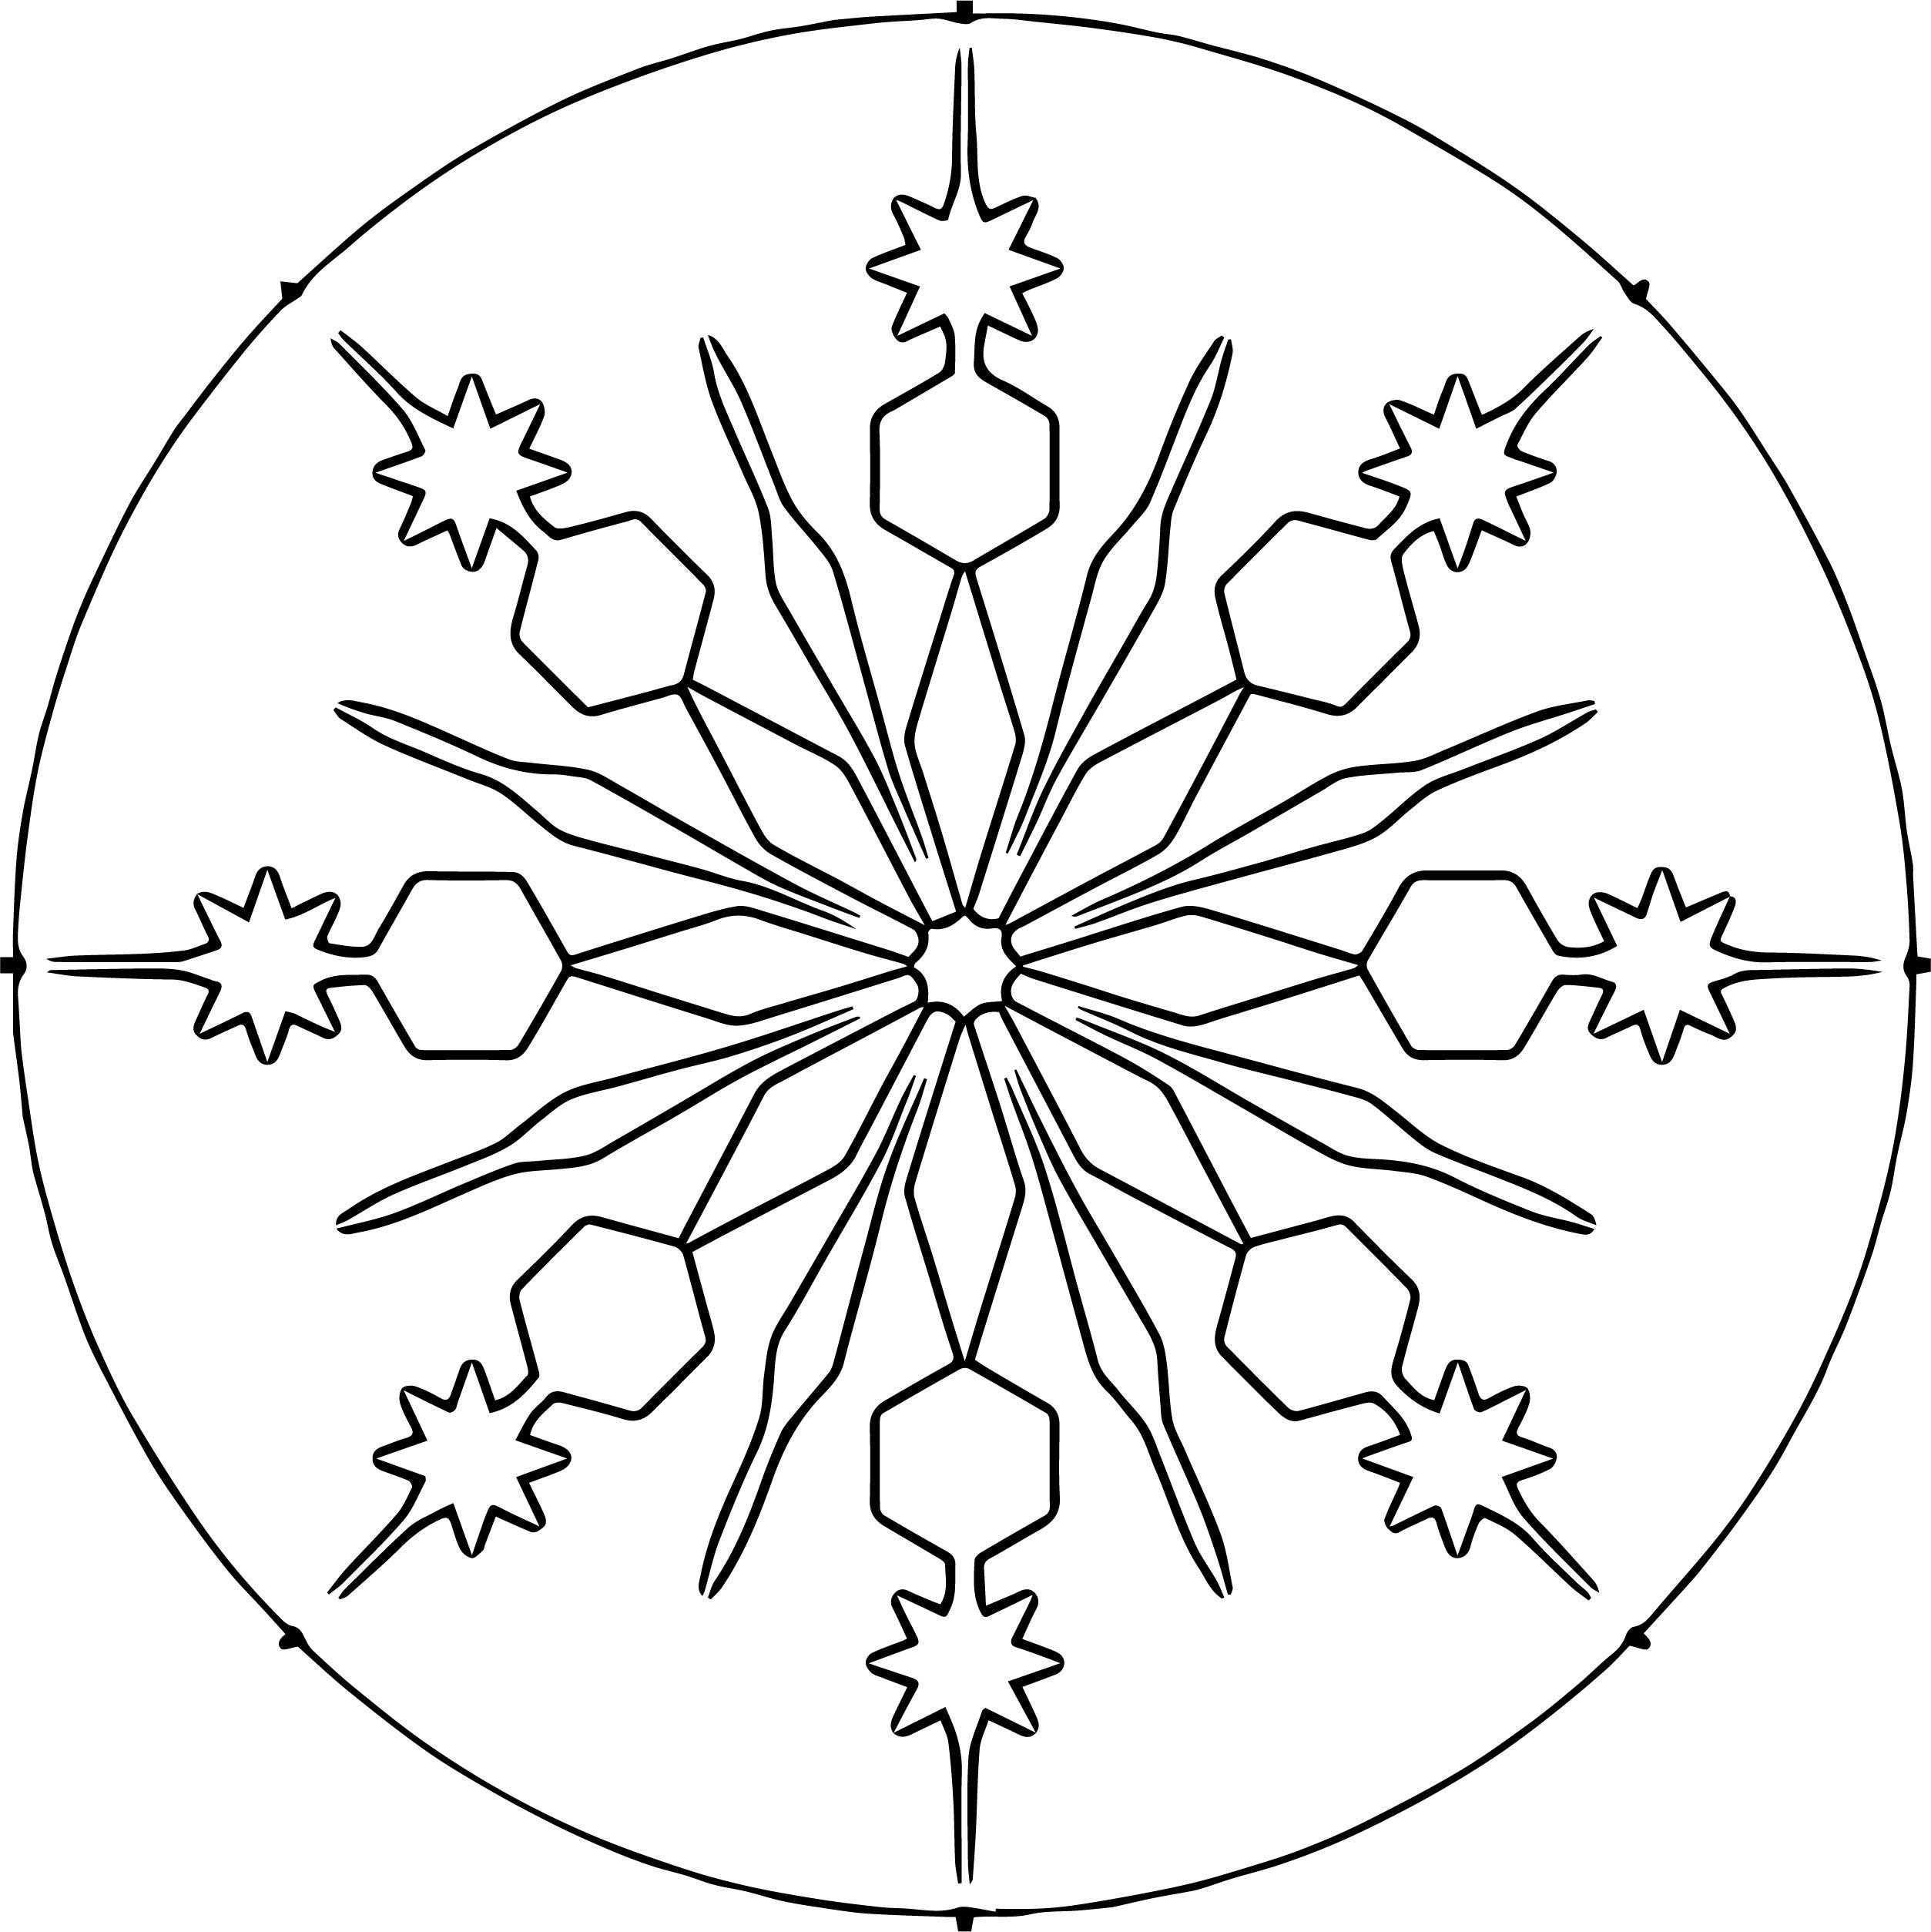 Circle Snowflake Coloring Page | Wecoloringpage